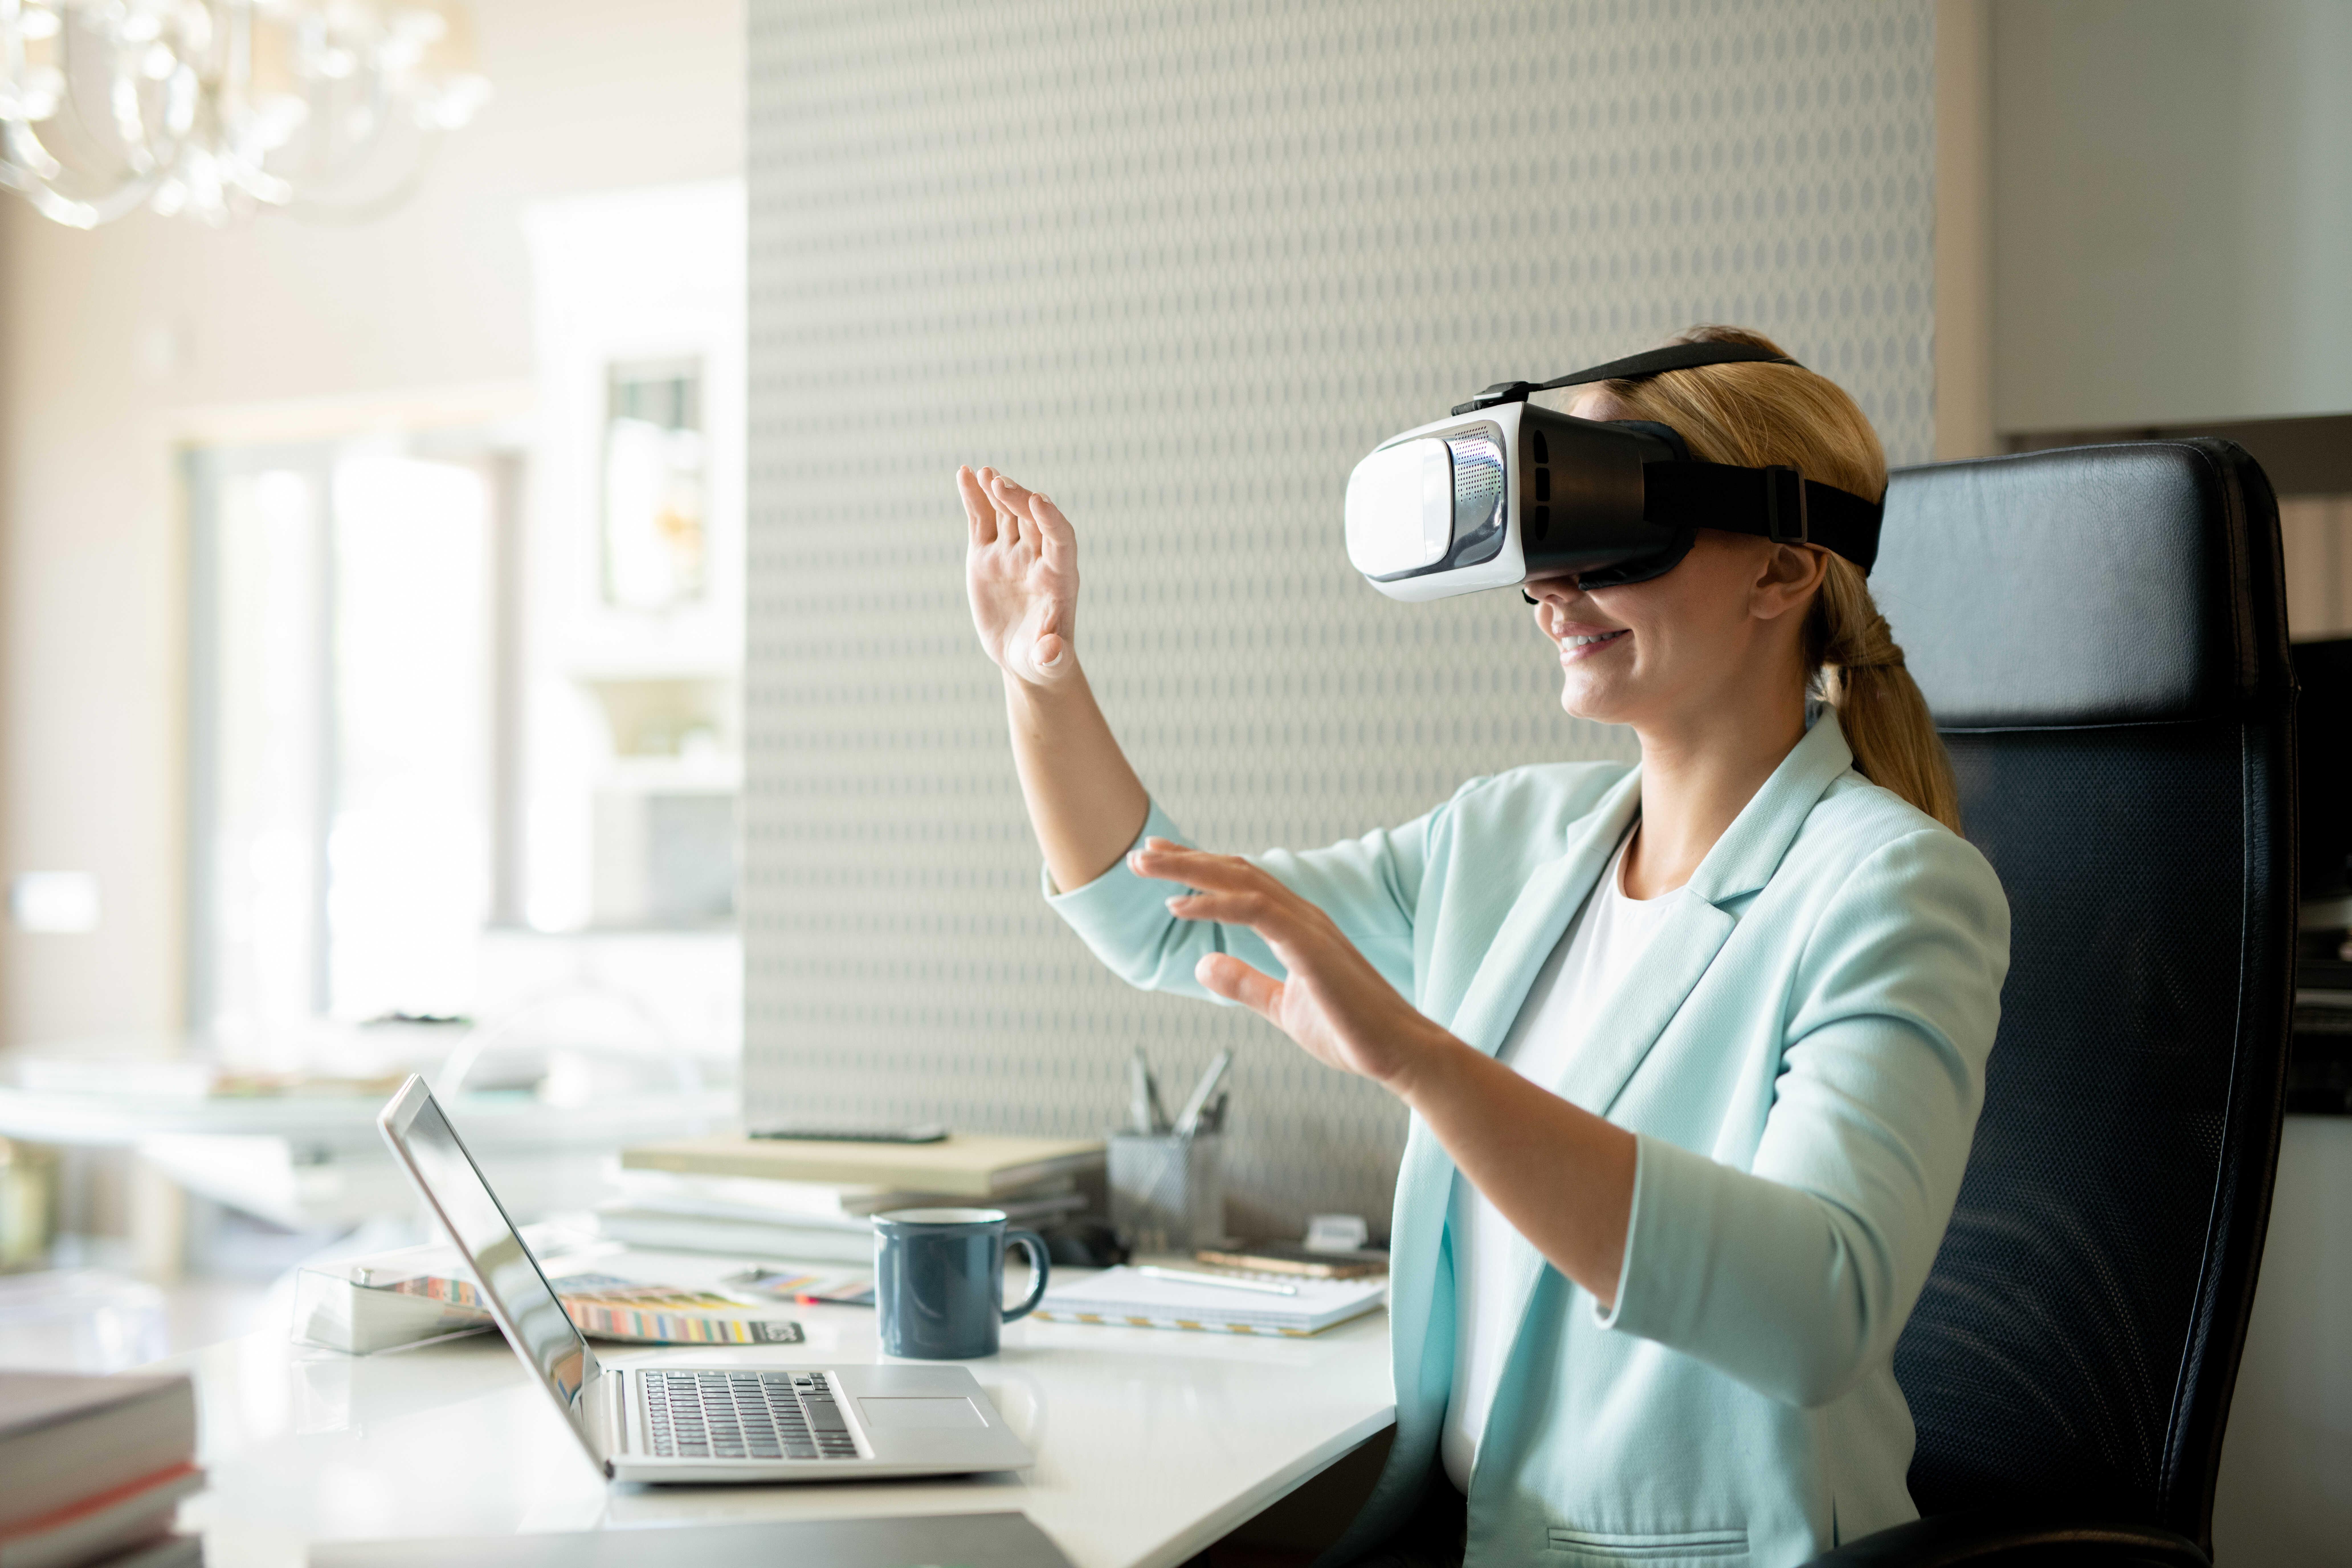 Aplikacja VR – po co i dla kogo?